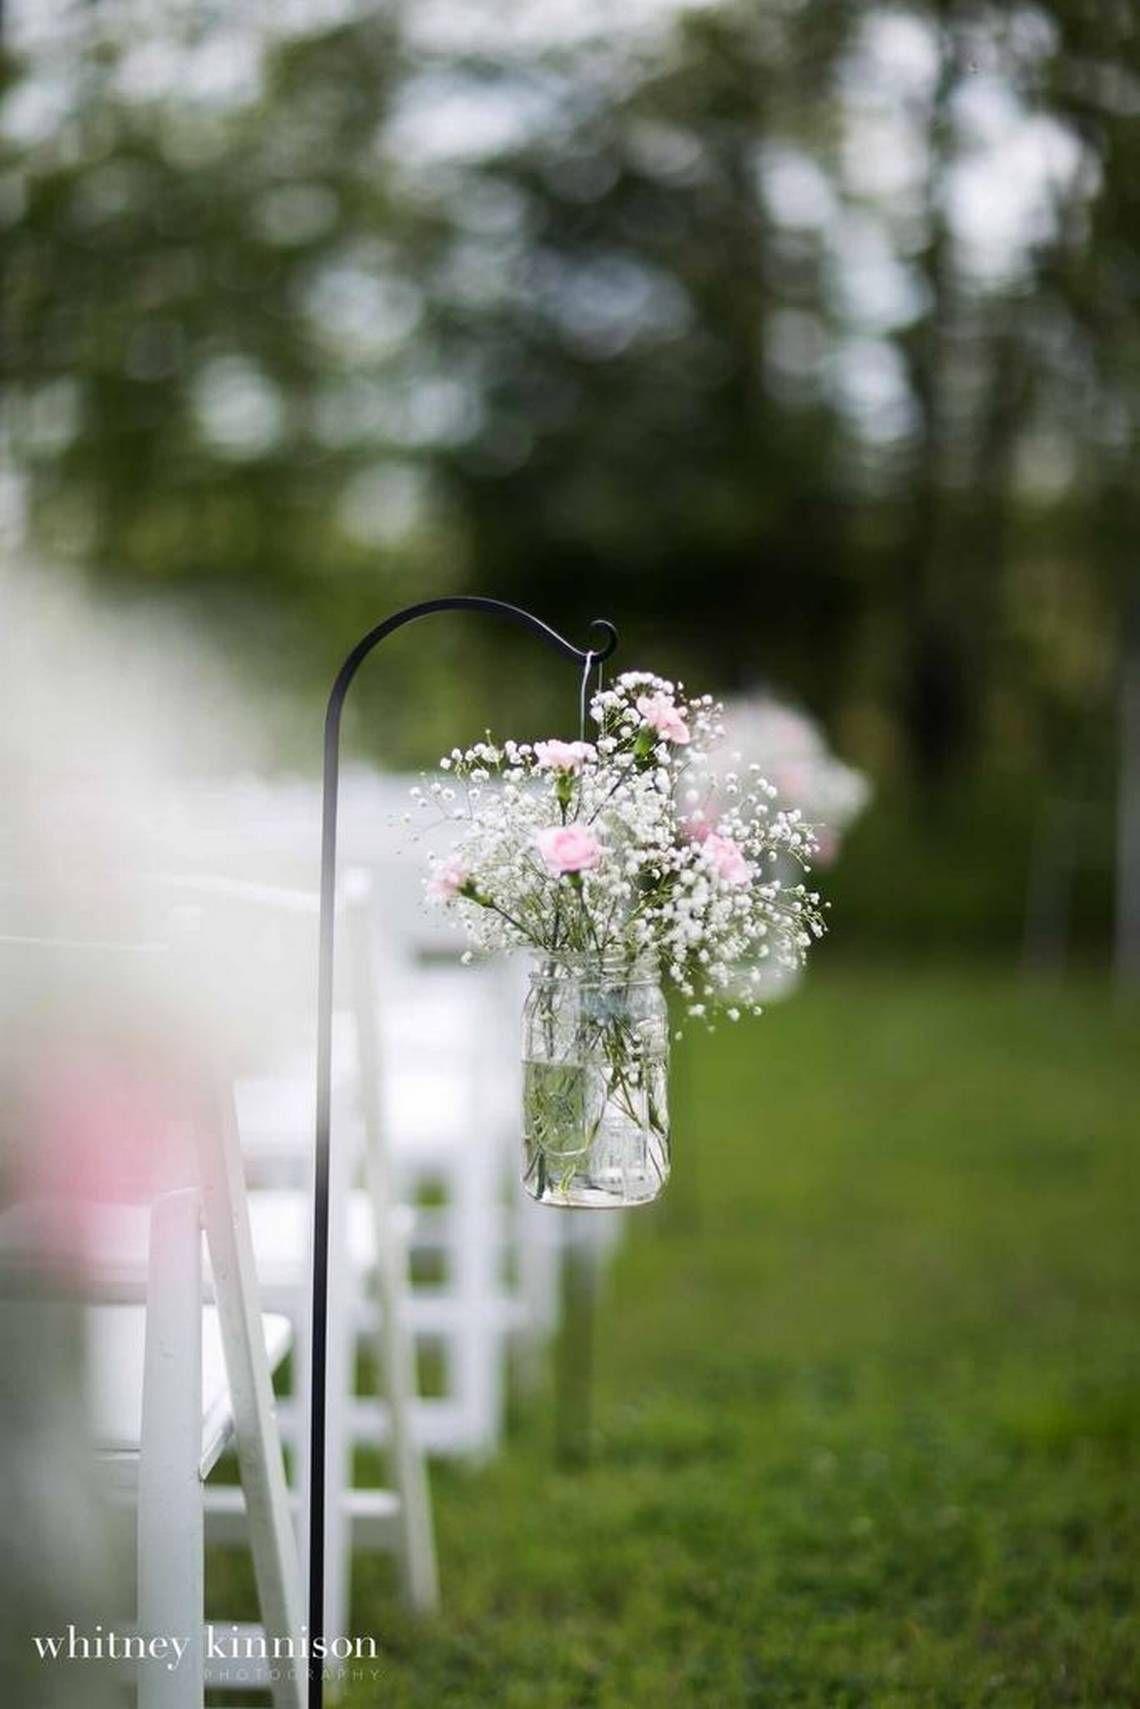 Wedding aisle decor ideas diy  DIY aisle markers were arranged with babyus breath and pink